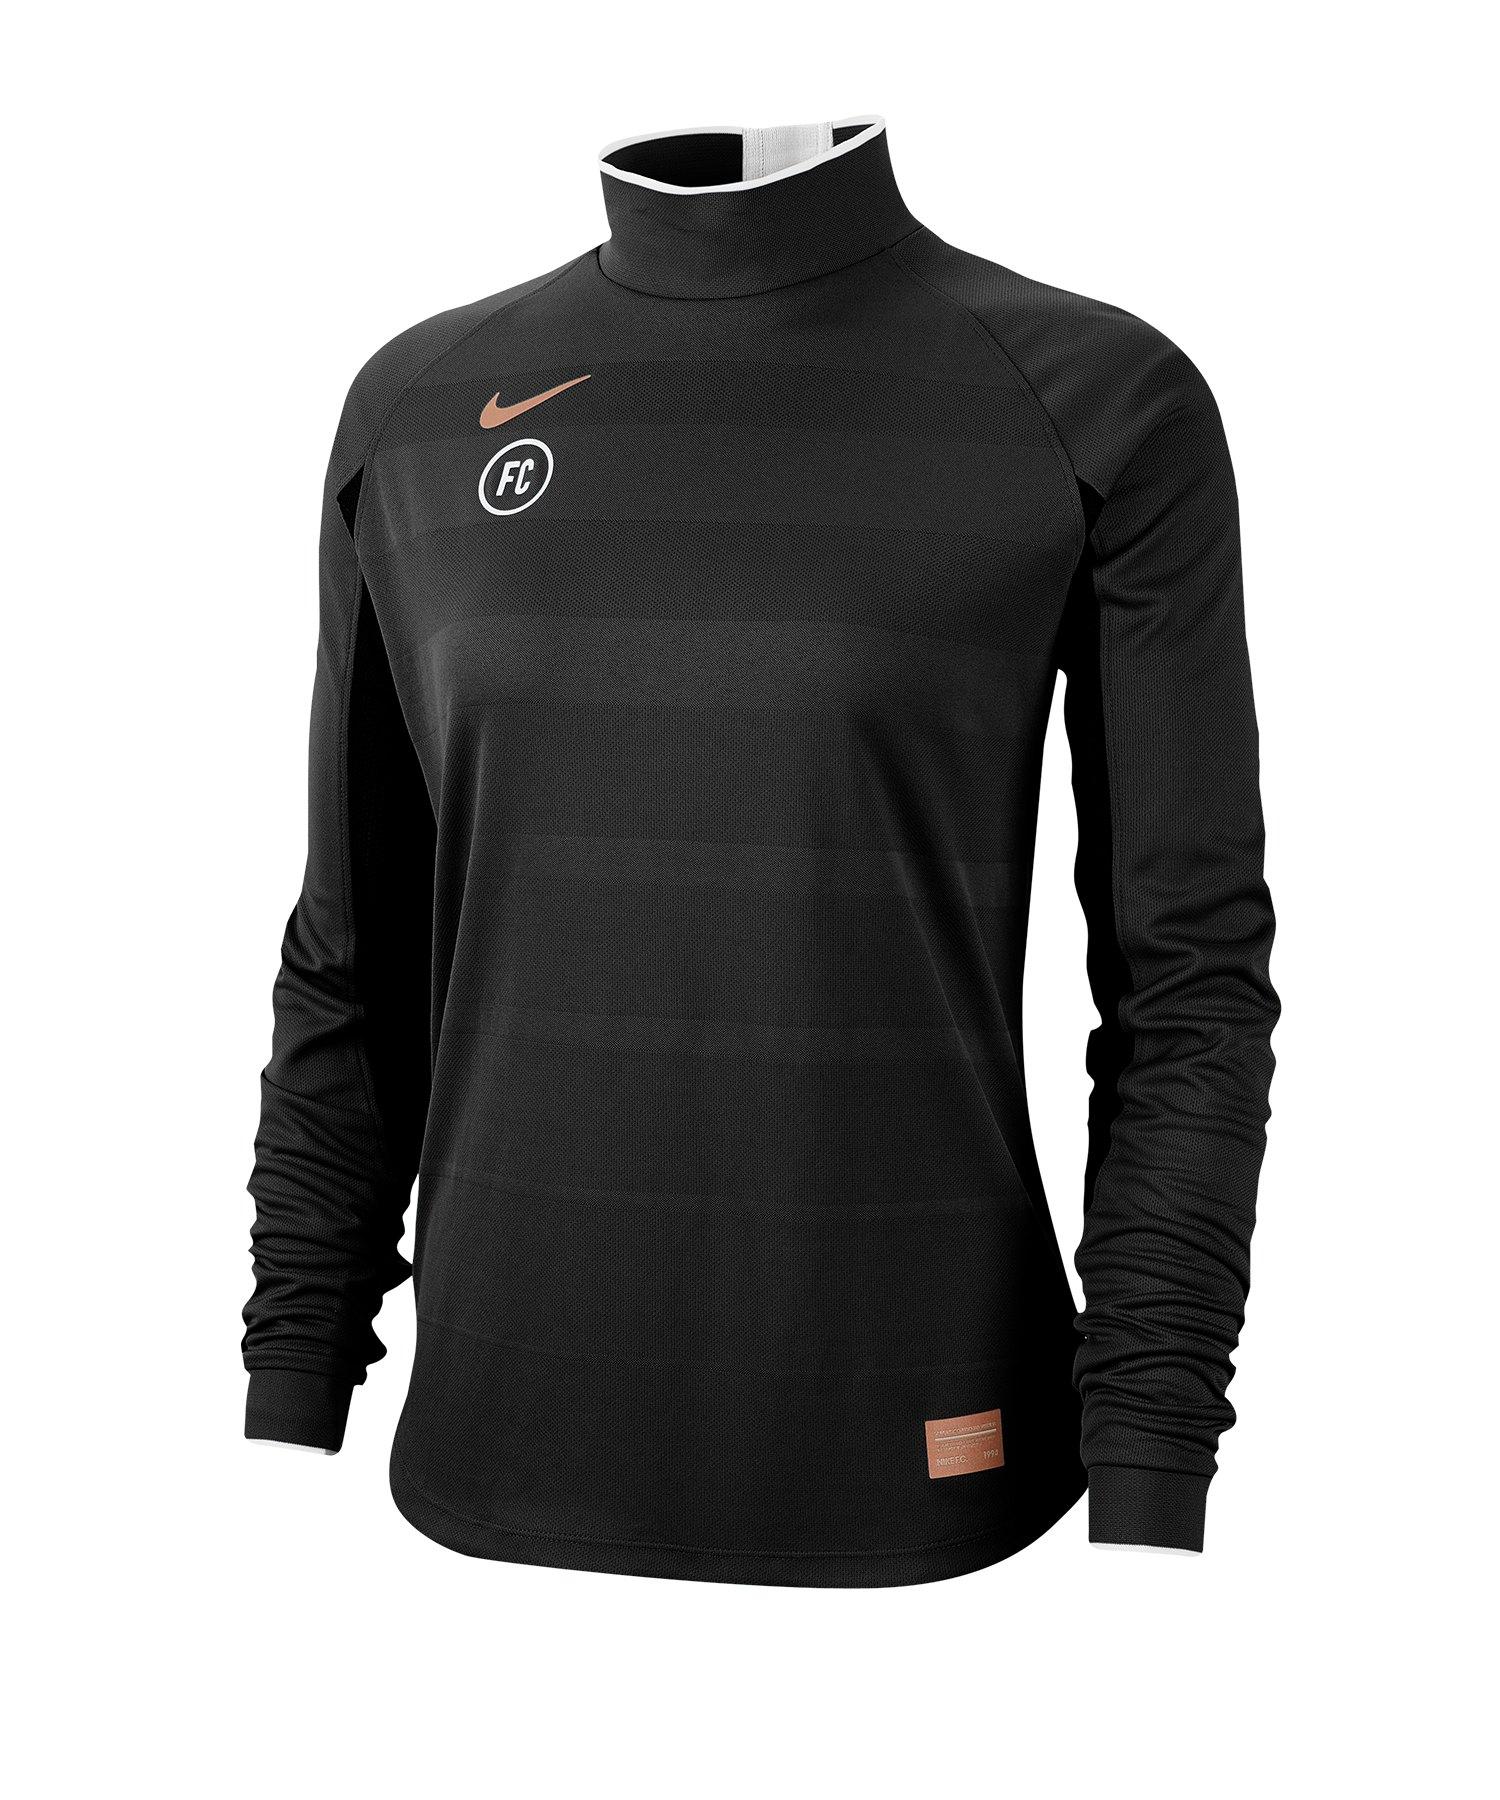 Nike F.C. Dri-FIT Trainingsweatshirt Damen F010 - schwarz